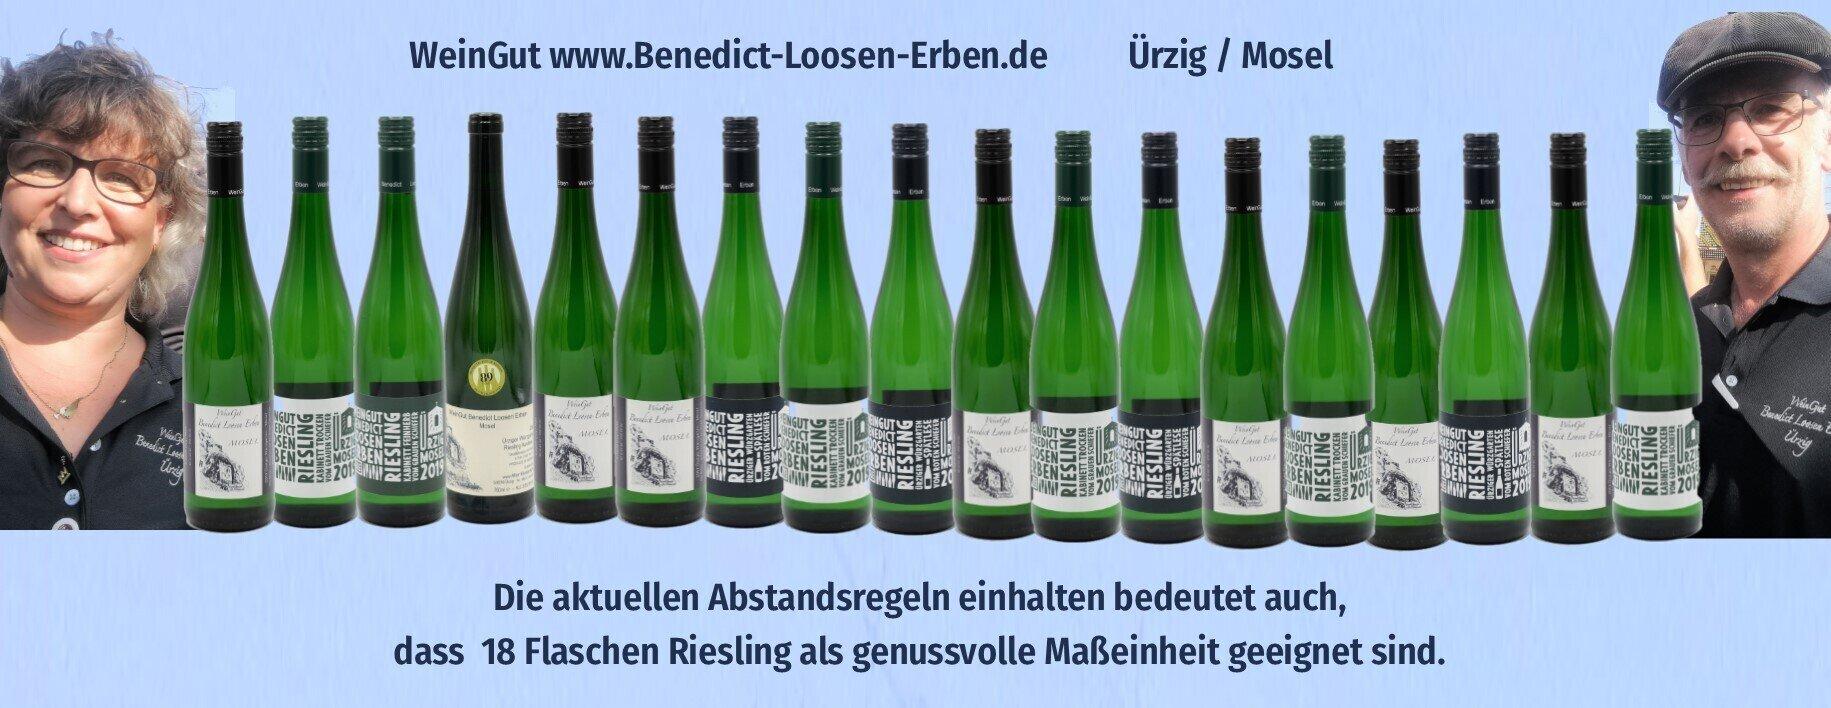 Miit Abstand genießen WeinGut Benedict Loosen Erben Ürzig Tel. 0160 84 28 967